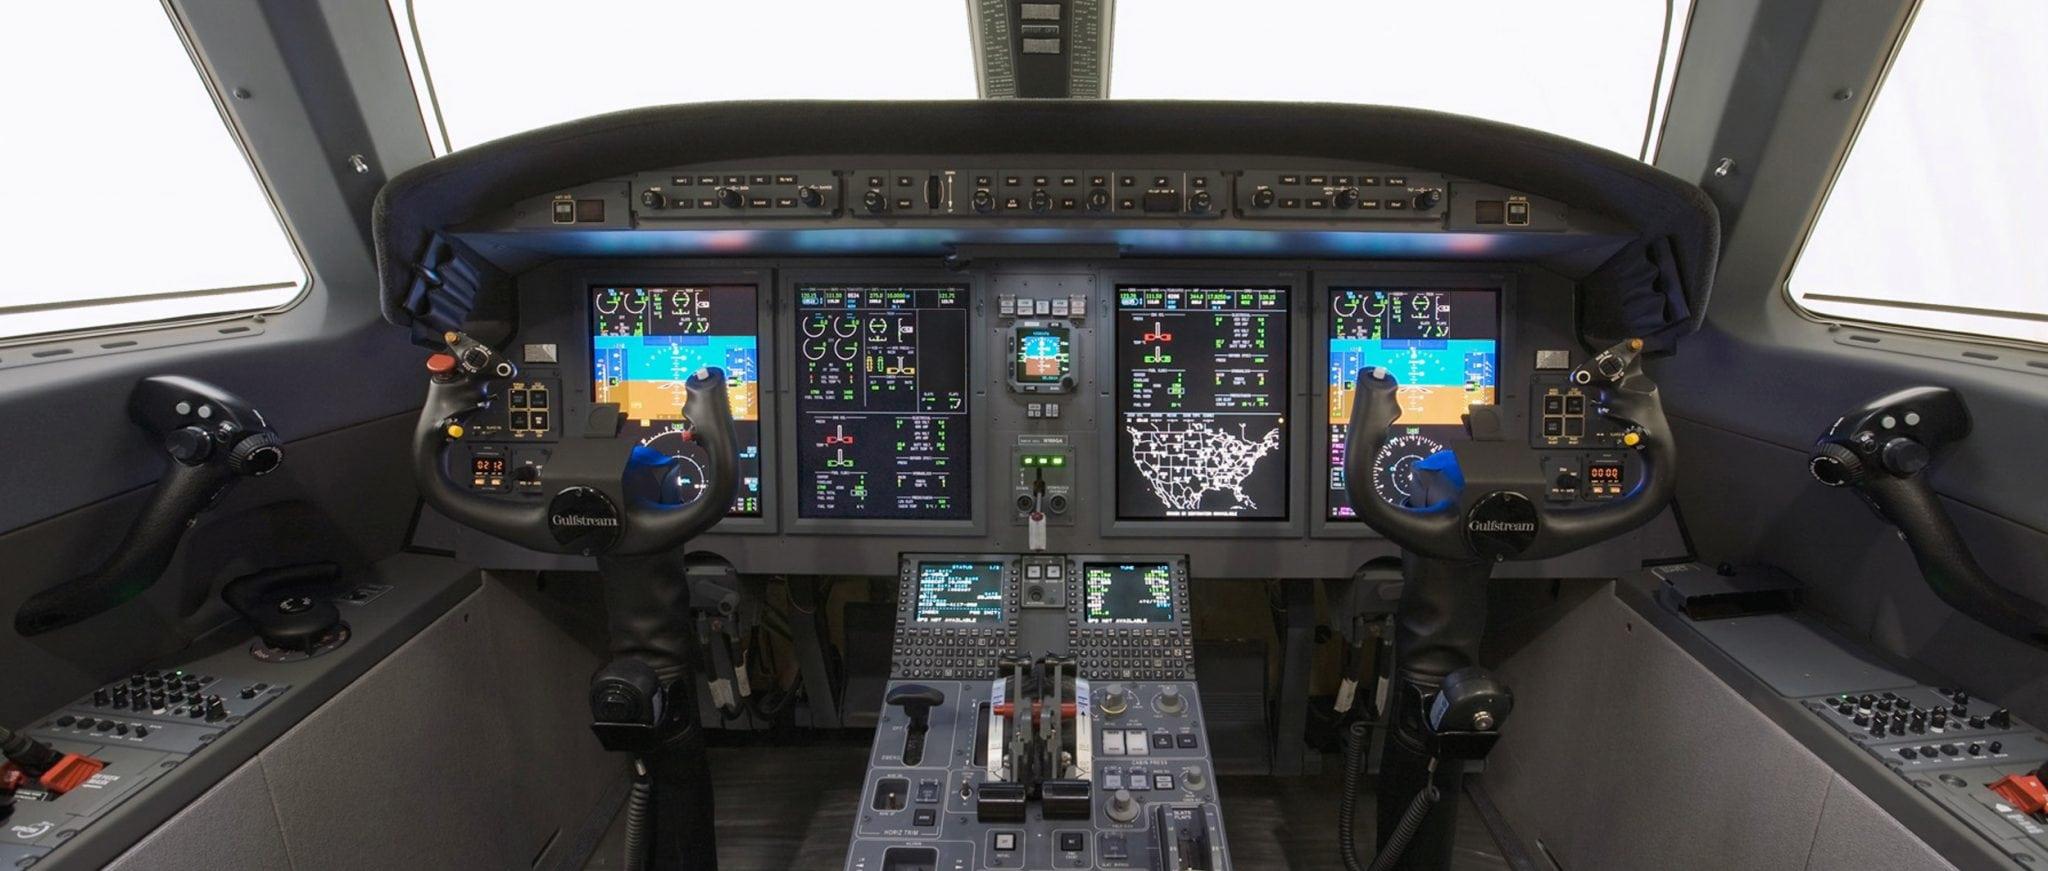 Gulfstream G150 cockpit avionics